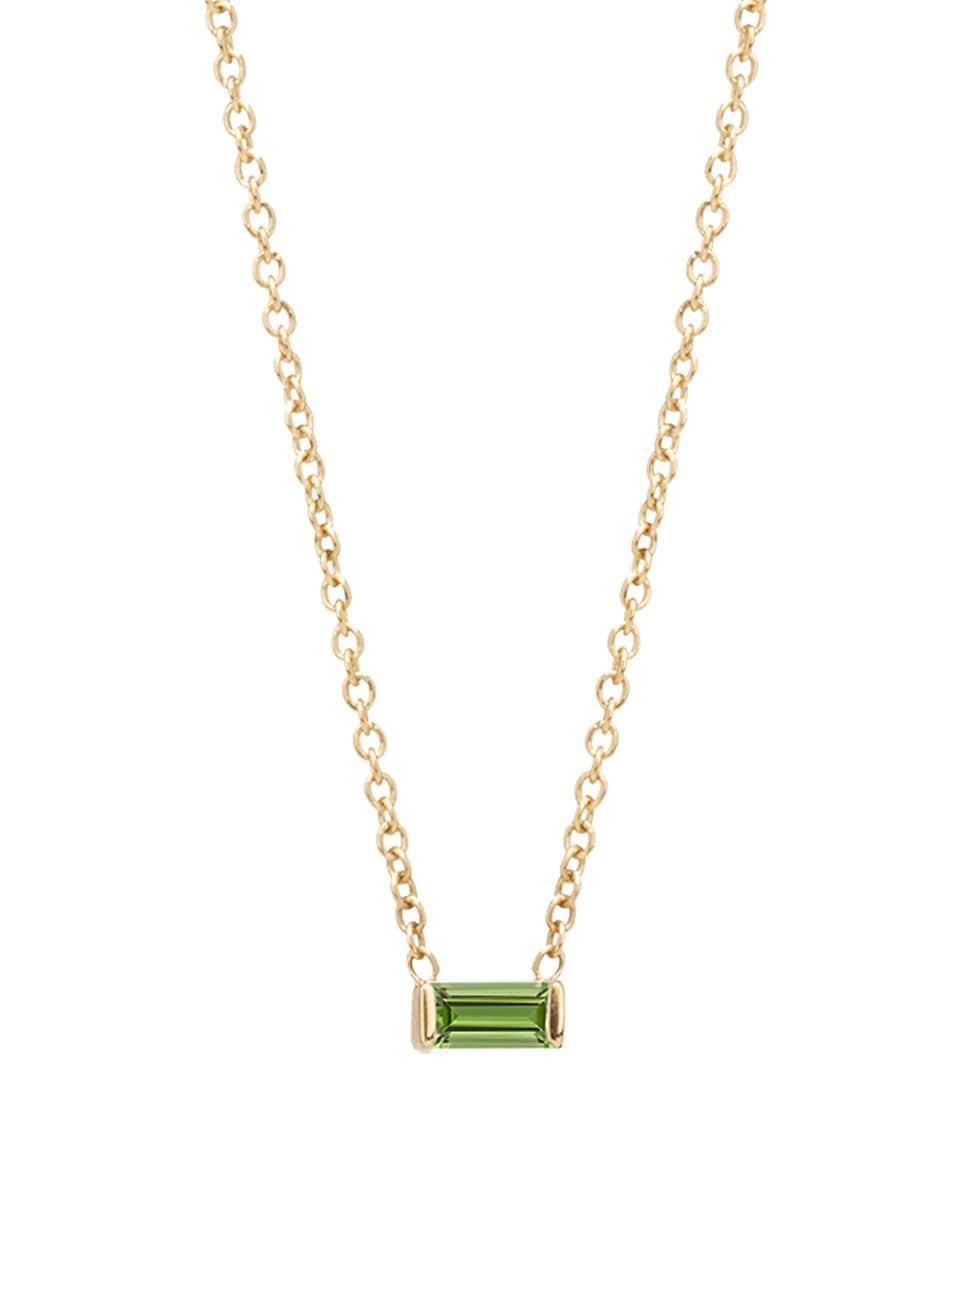 Zoë Chicco Women's Birthstones 14k Yellow Gold & Peridot Horizontal Baguette Necklace